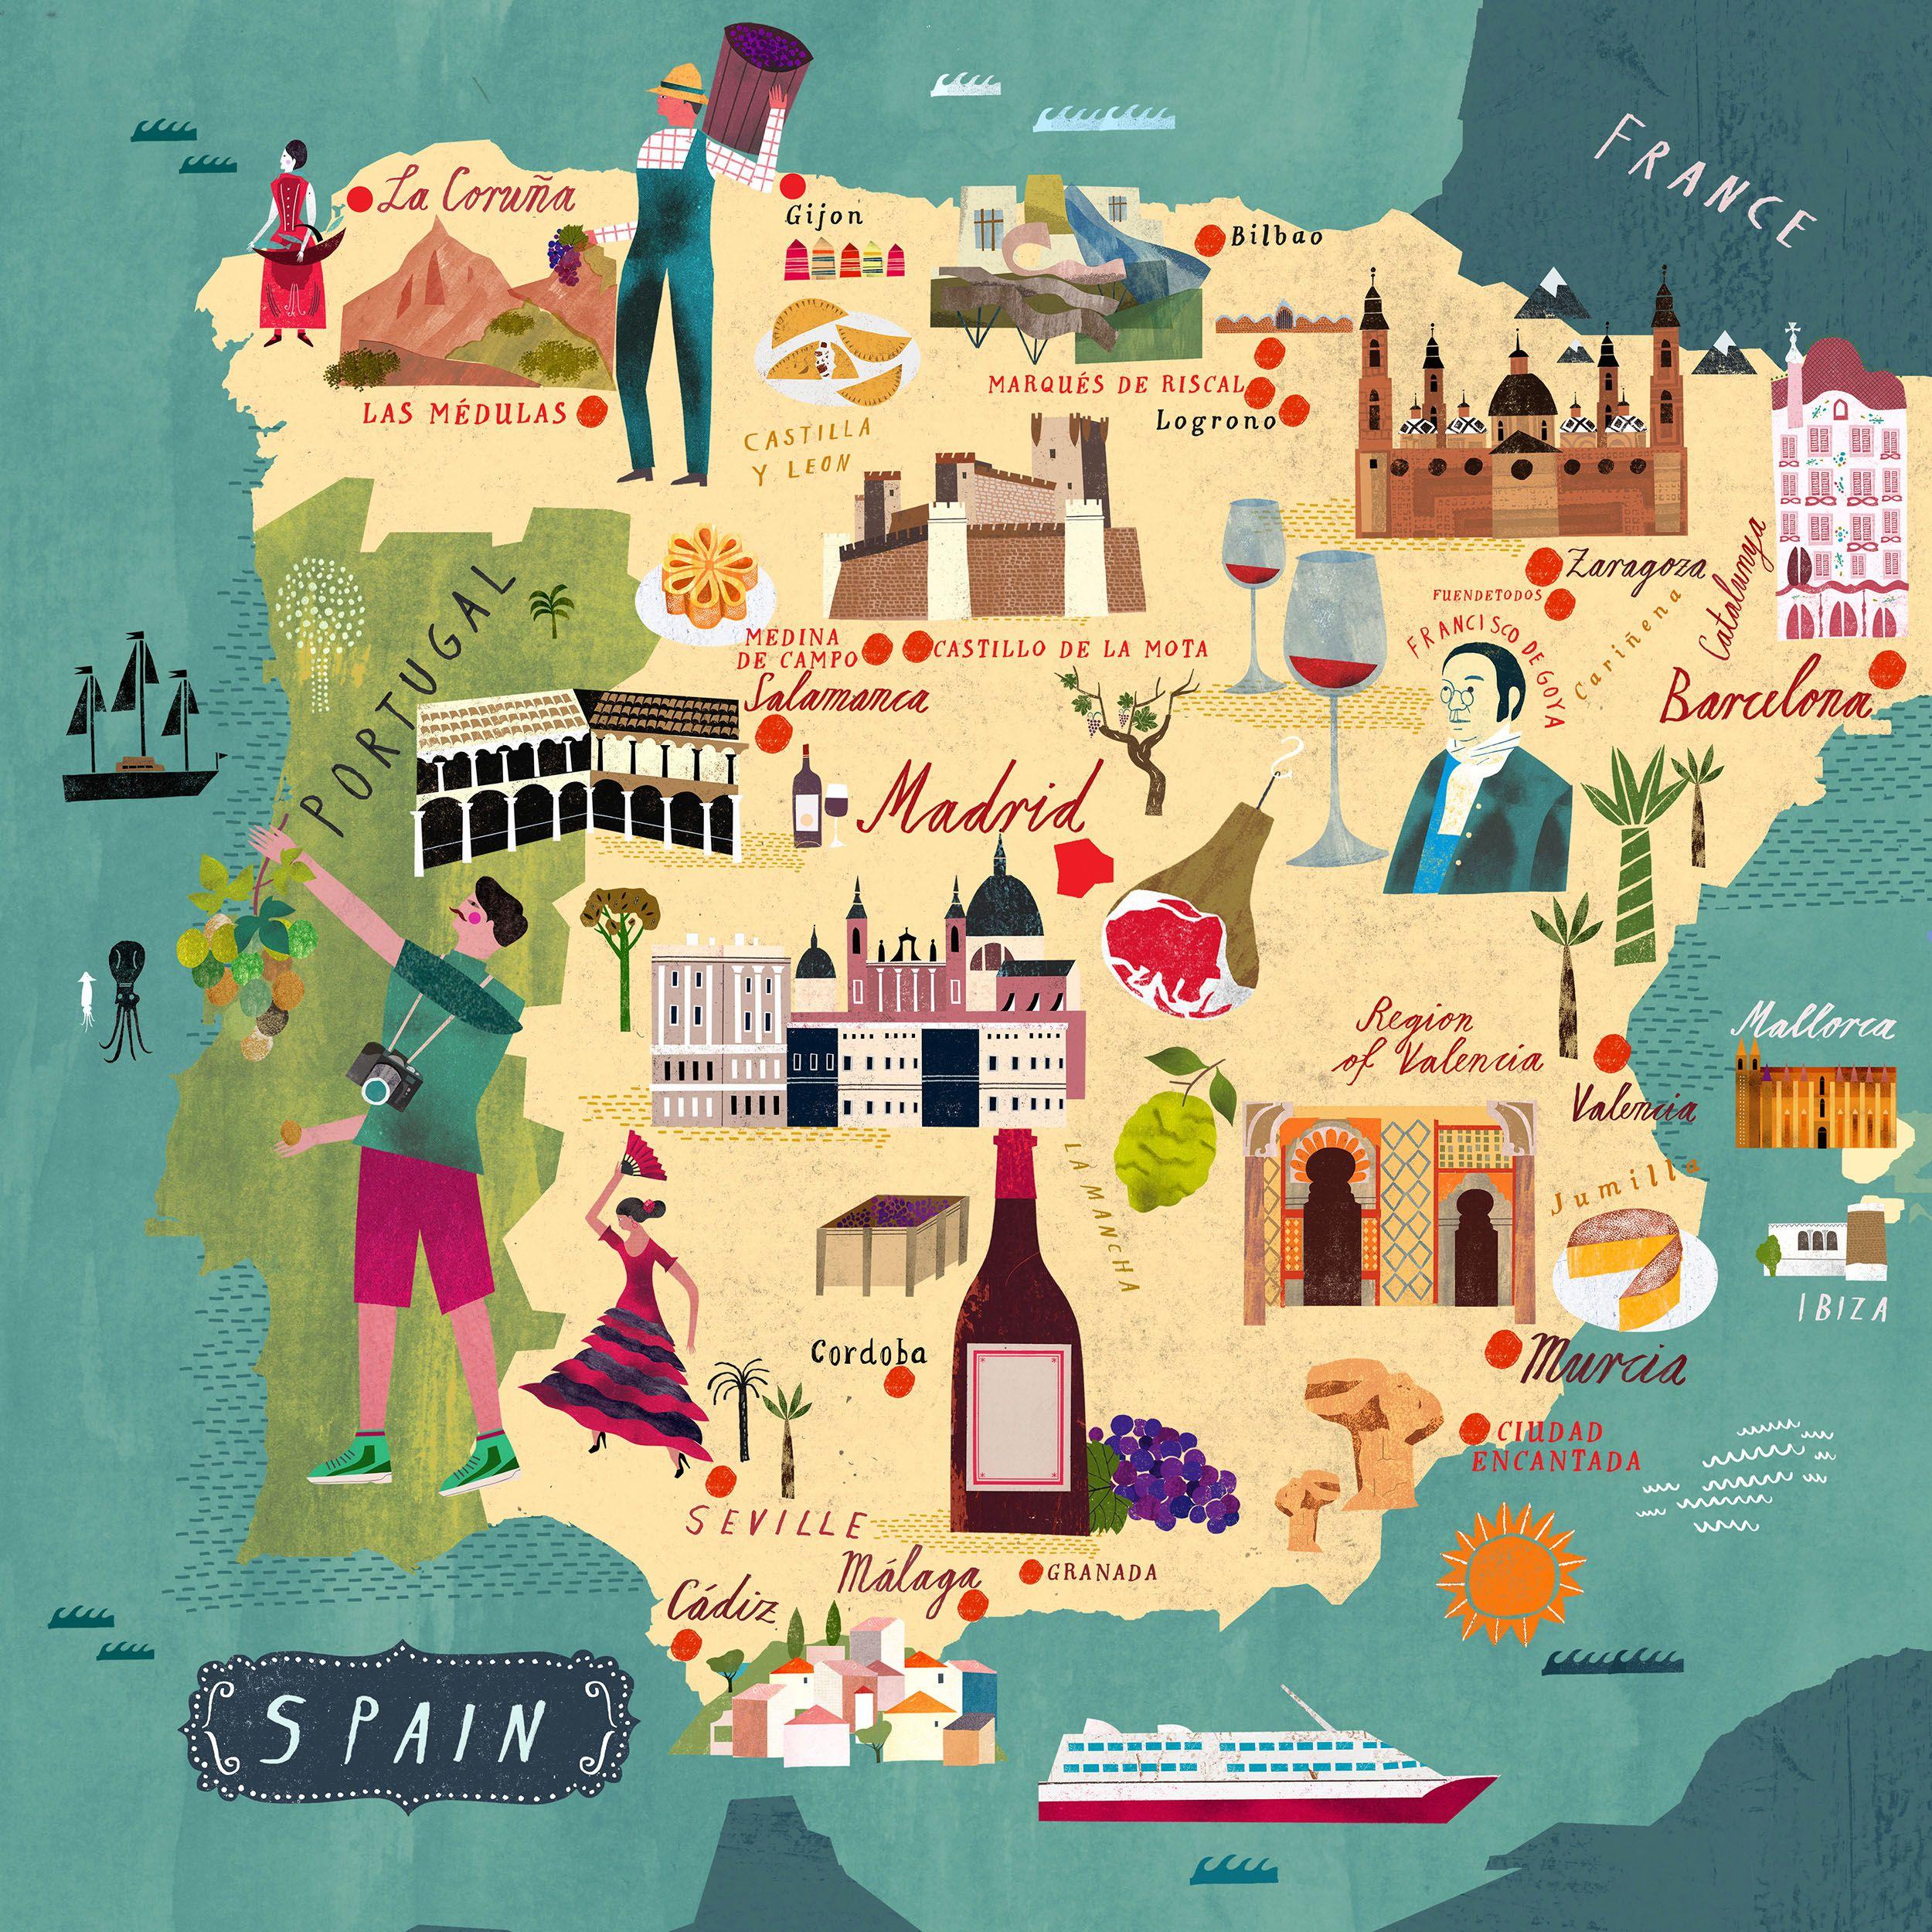 Map Of Spain For Vinos Martin Haake Illustrations